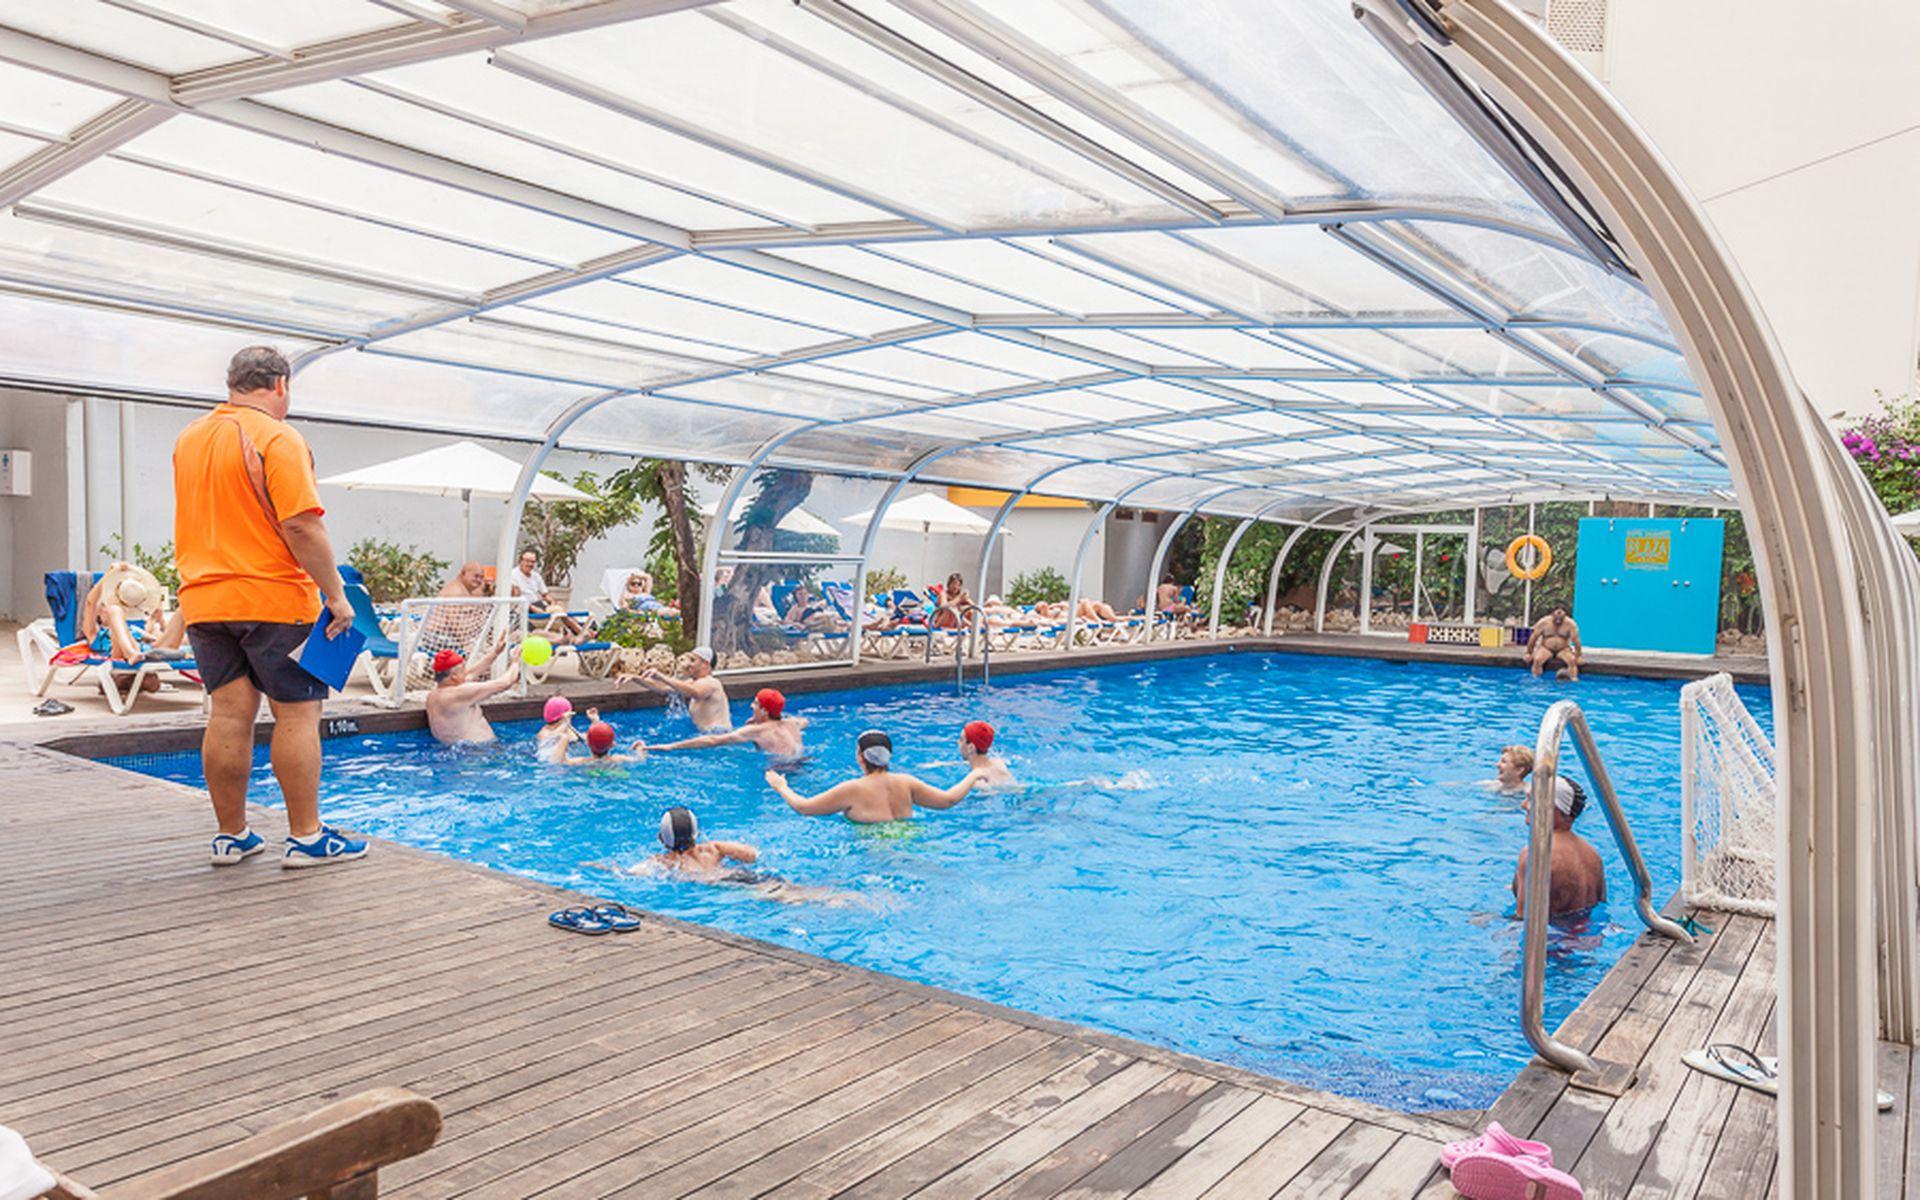 Hotel benidorm plaza en benidorm costa blanca desde 33 for Piscinas benidorm